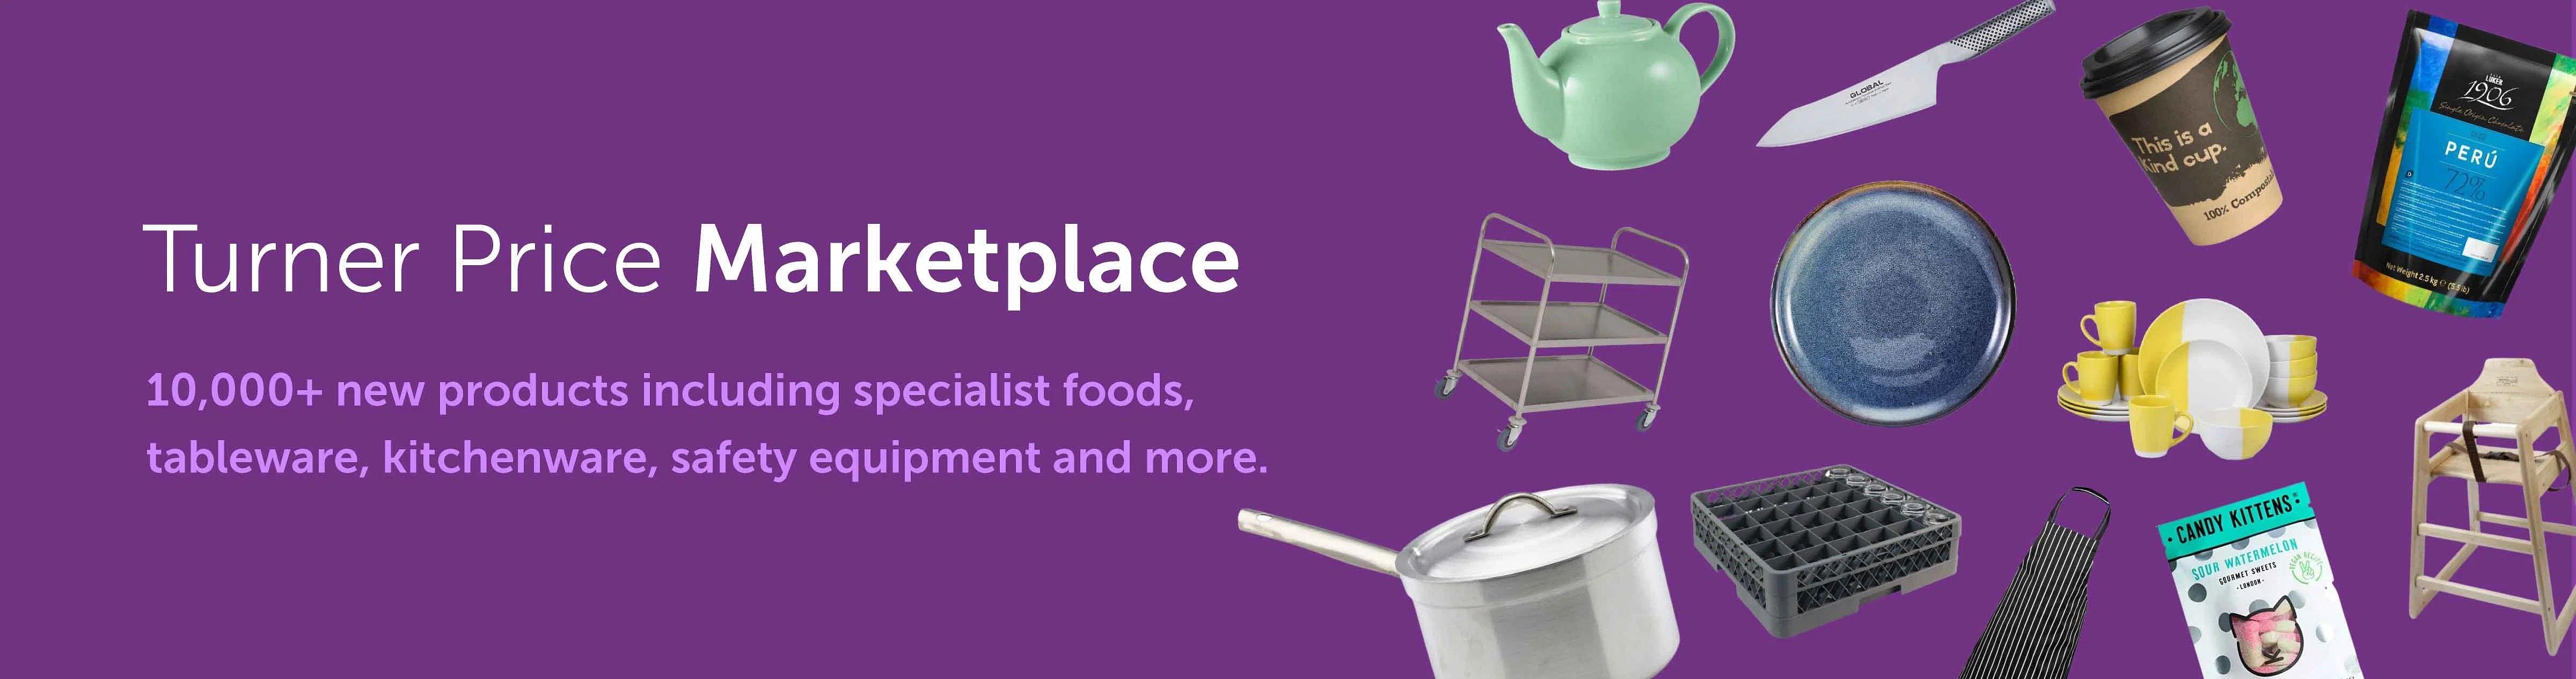 TP Marketplace banner copy